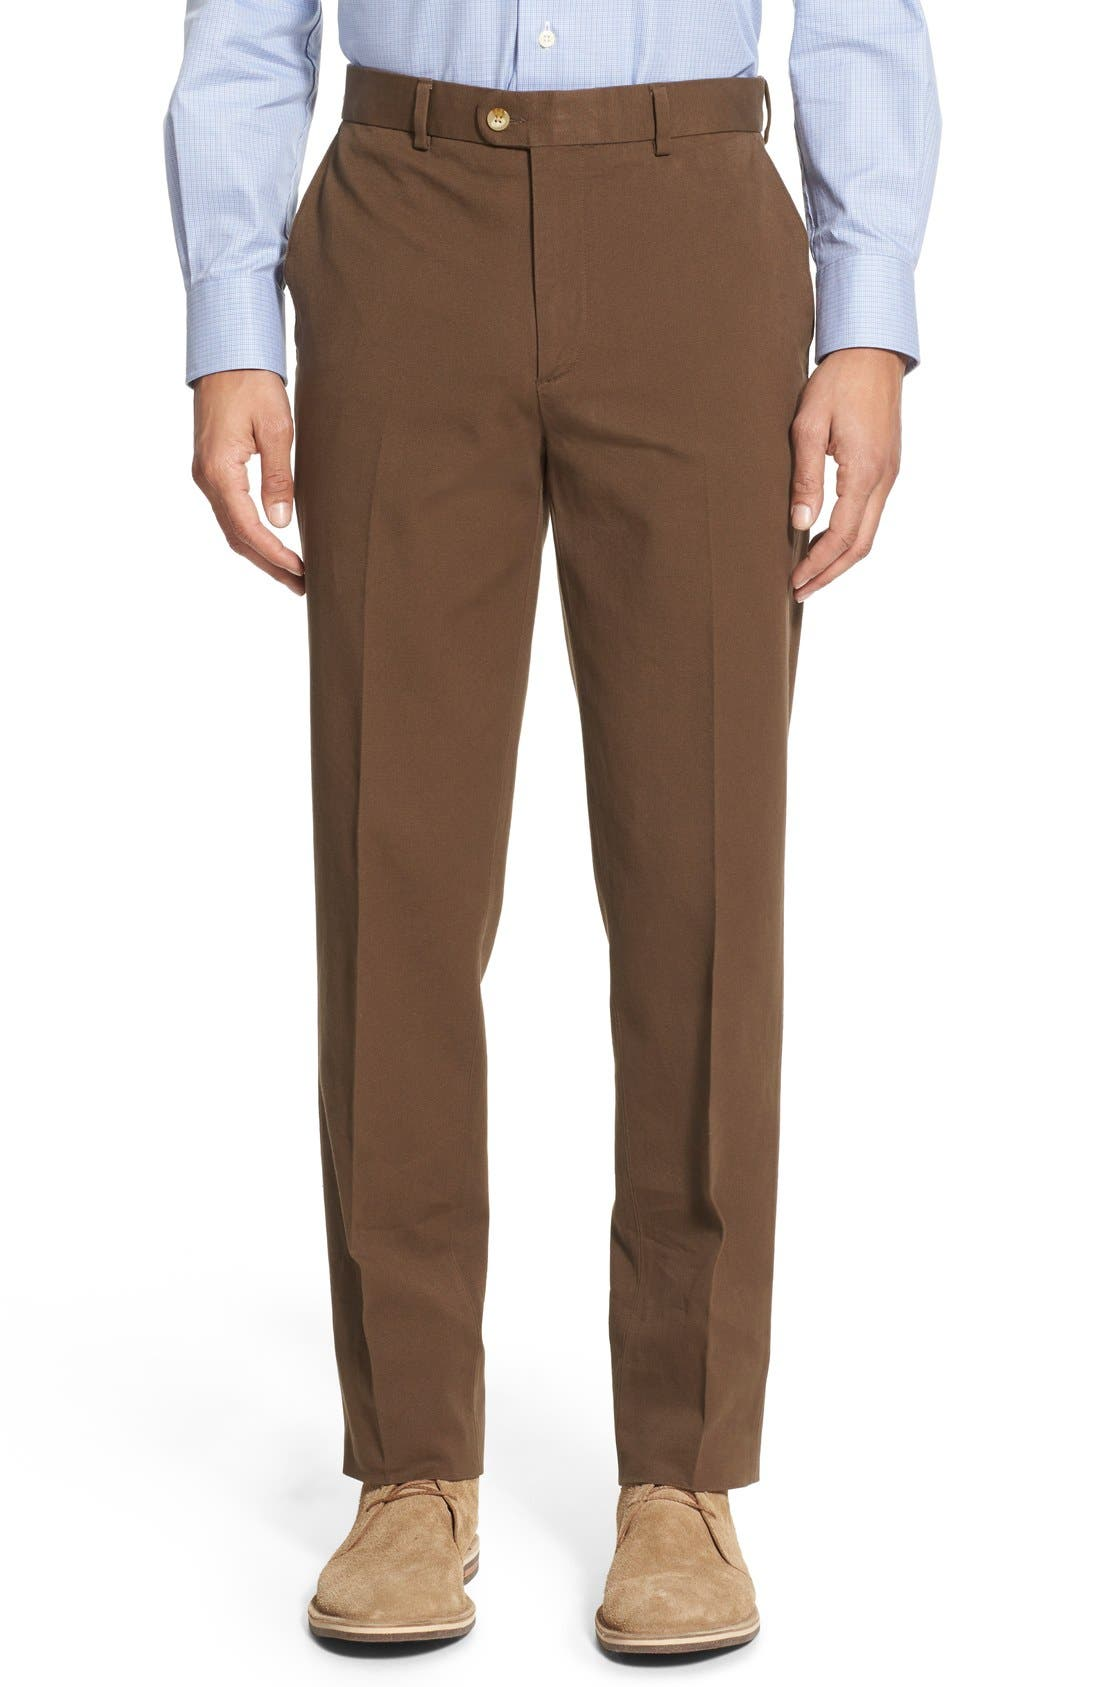 Bensol Trim Fit Stretch Cotton Ottoman Trousers